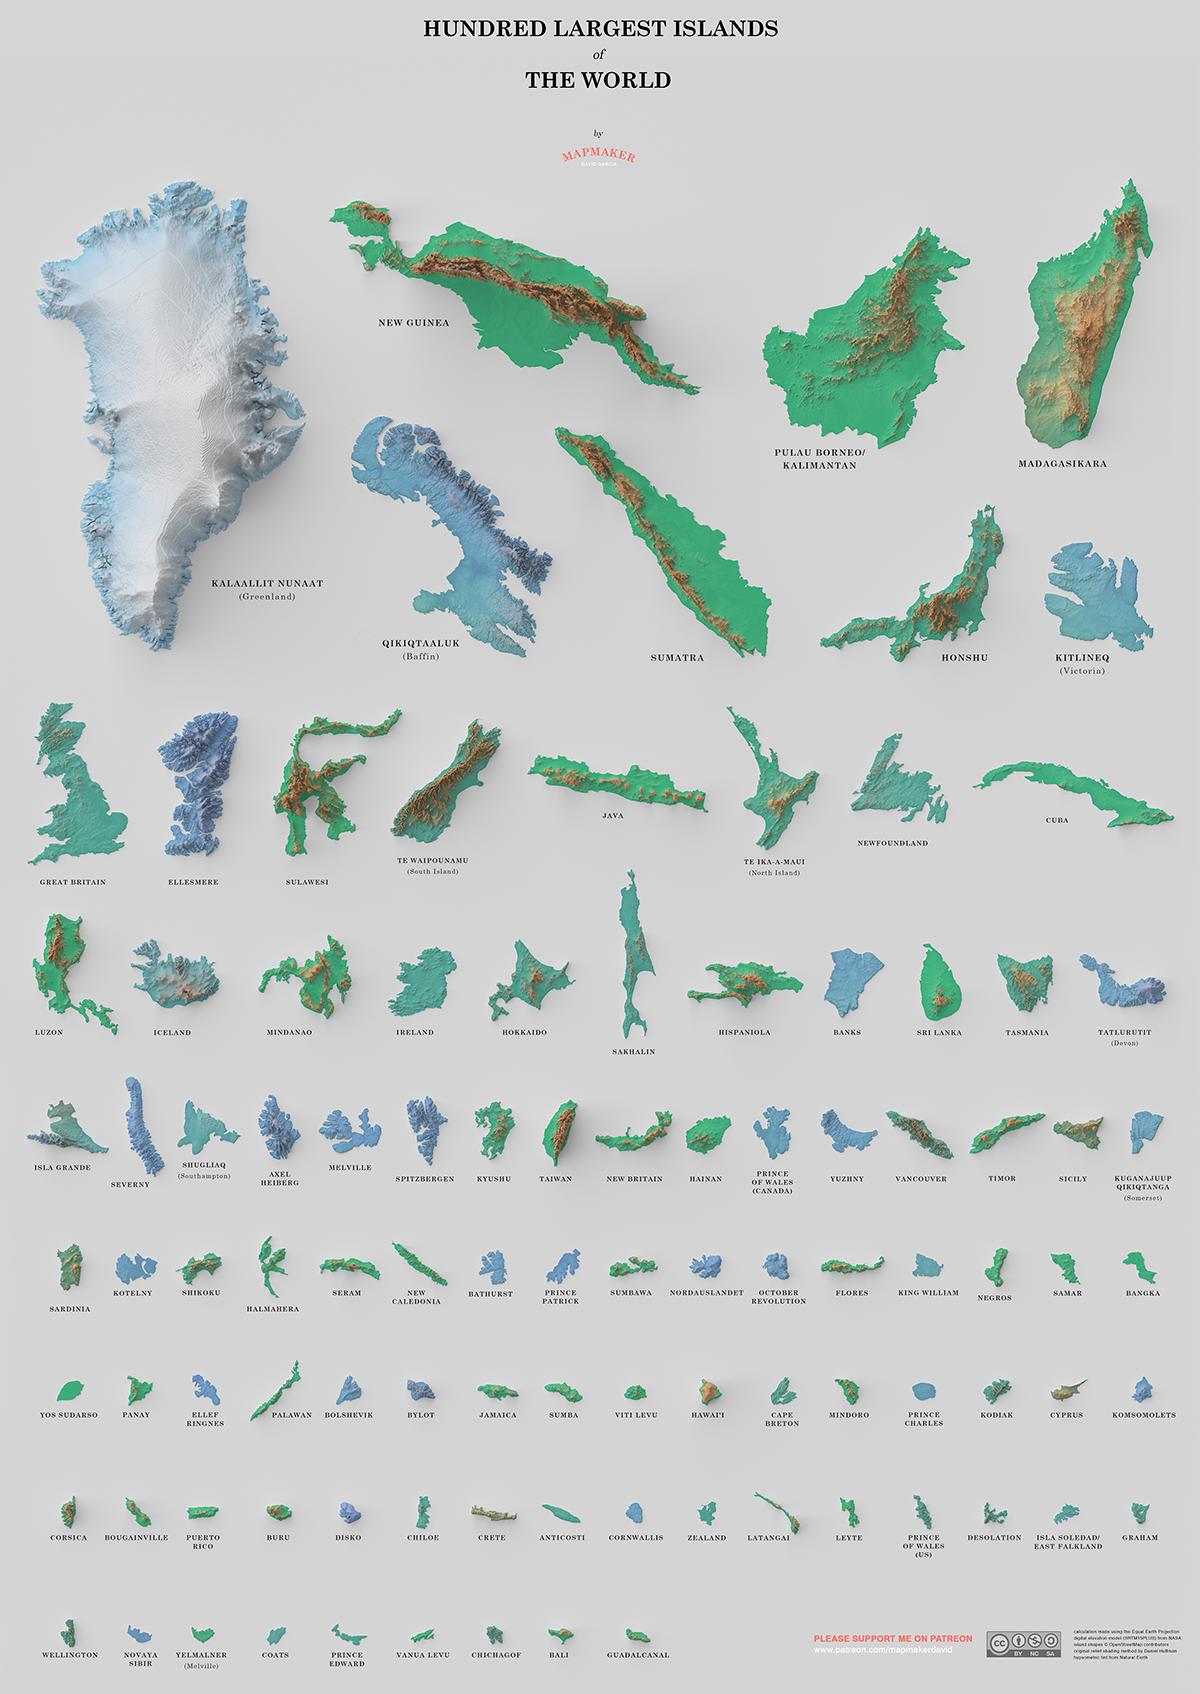 largest-100-islands-1200